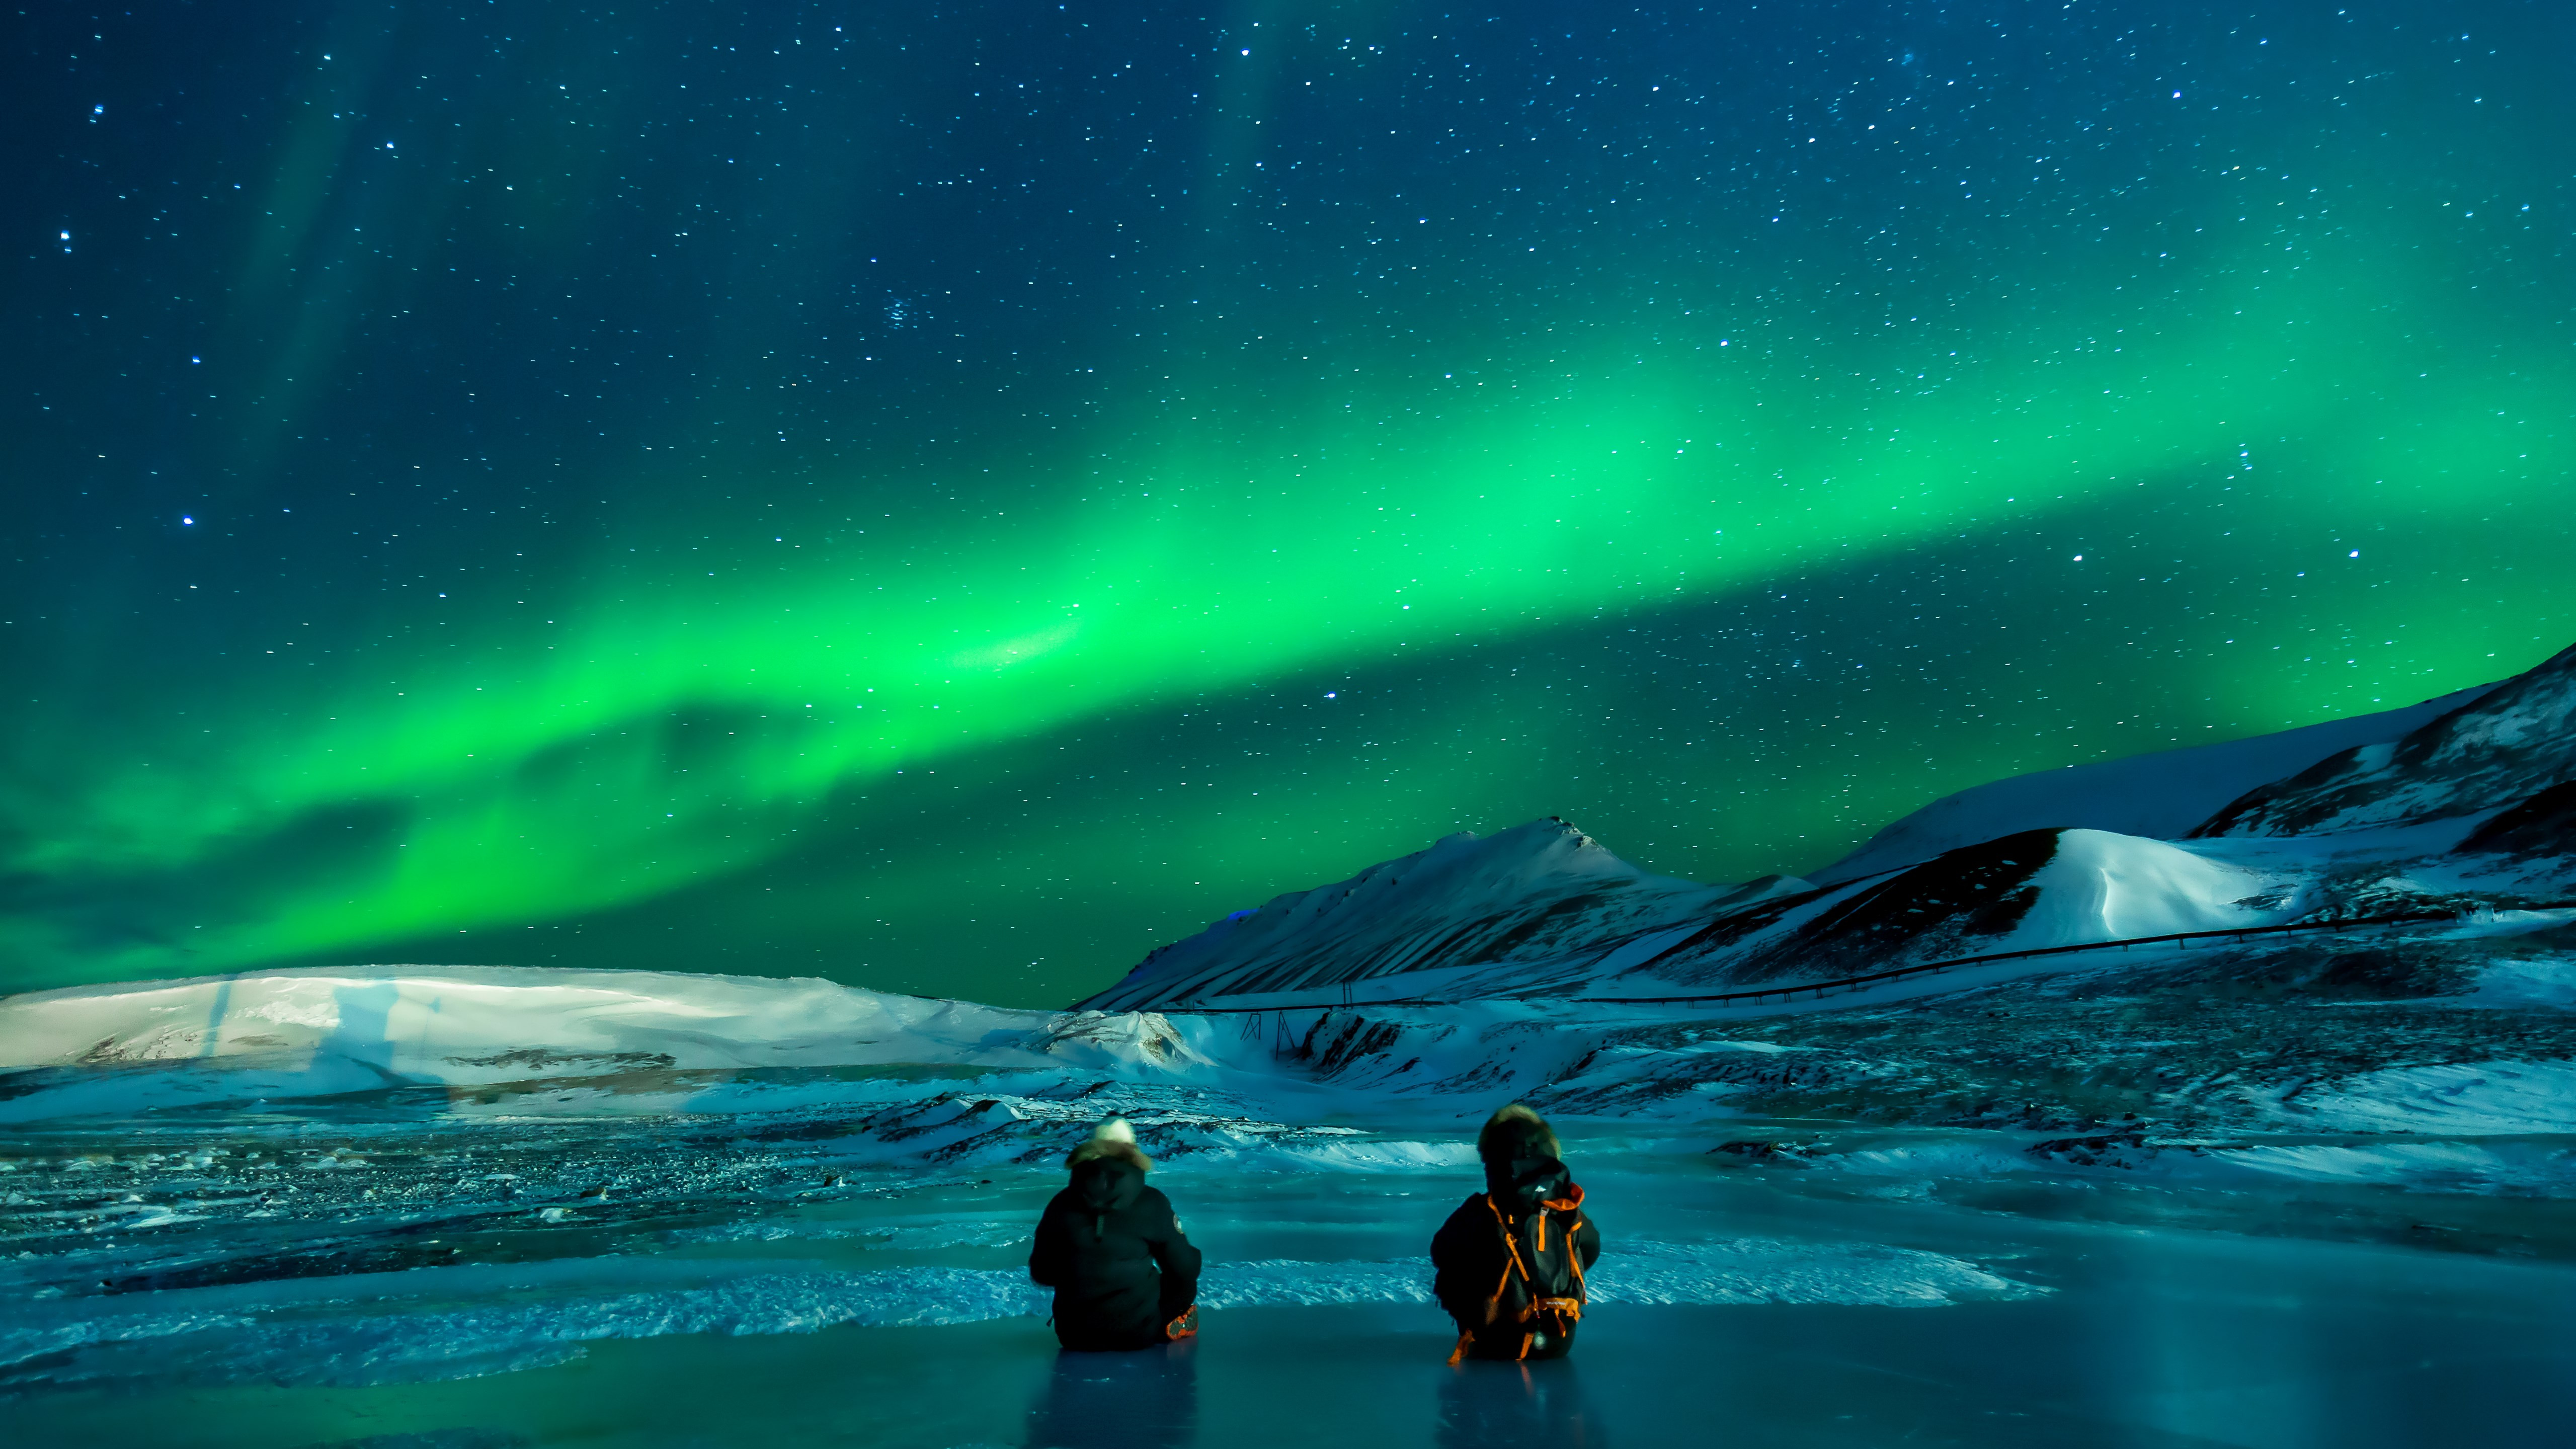 download wallpaper  aurora borealis 5120x2880